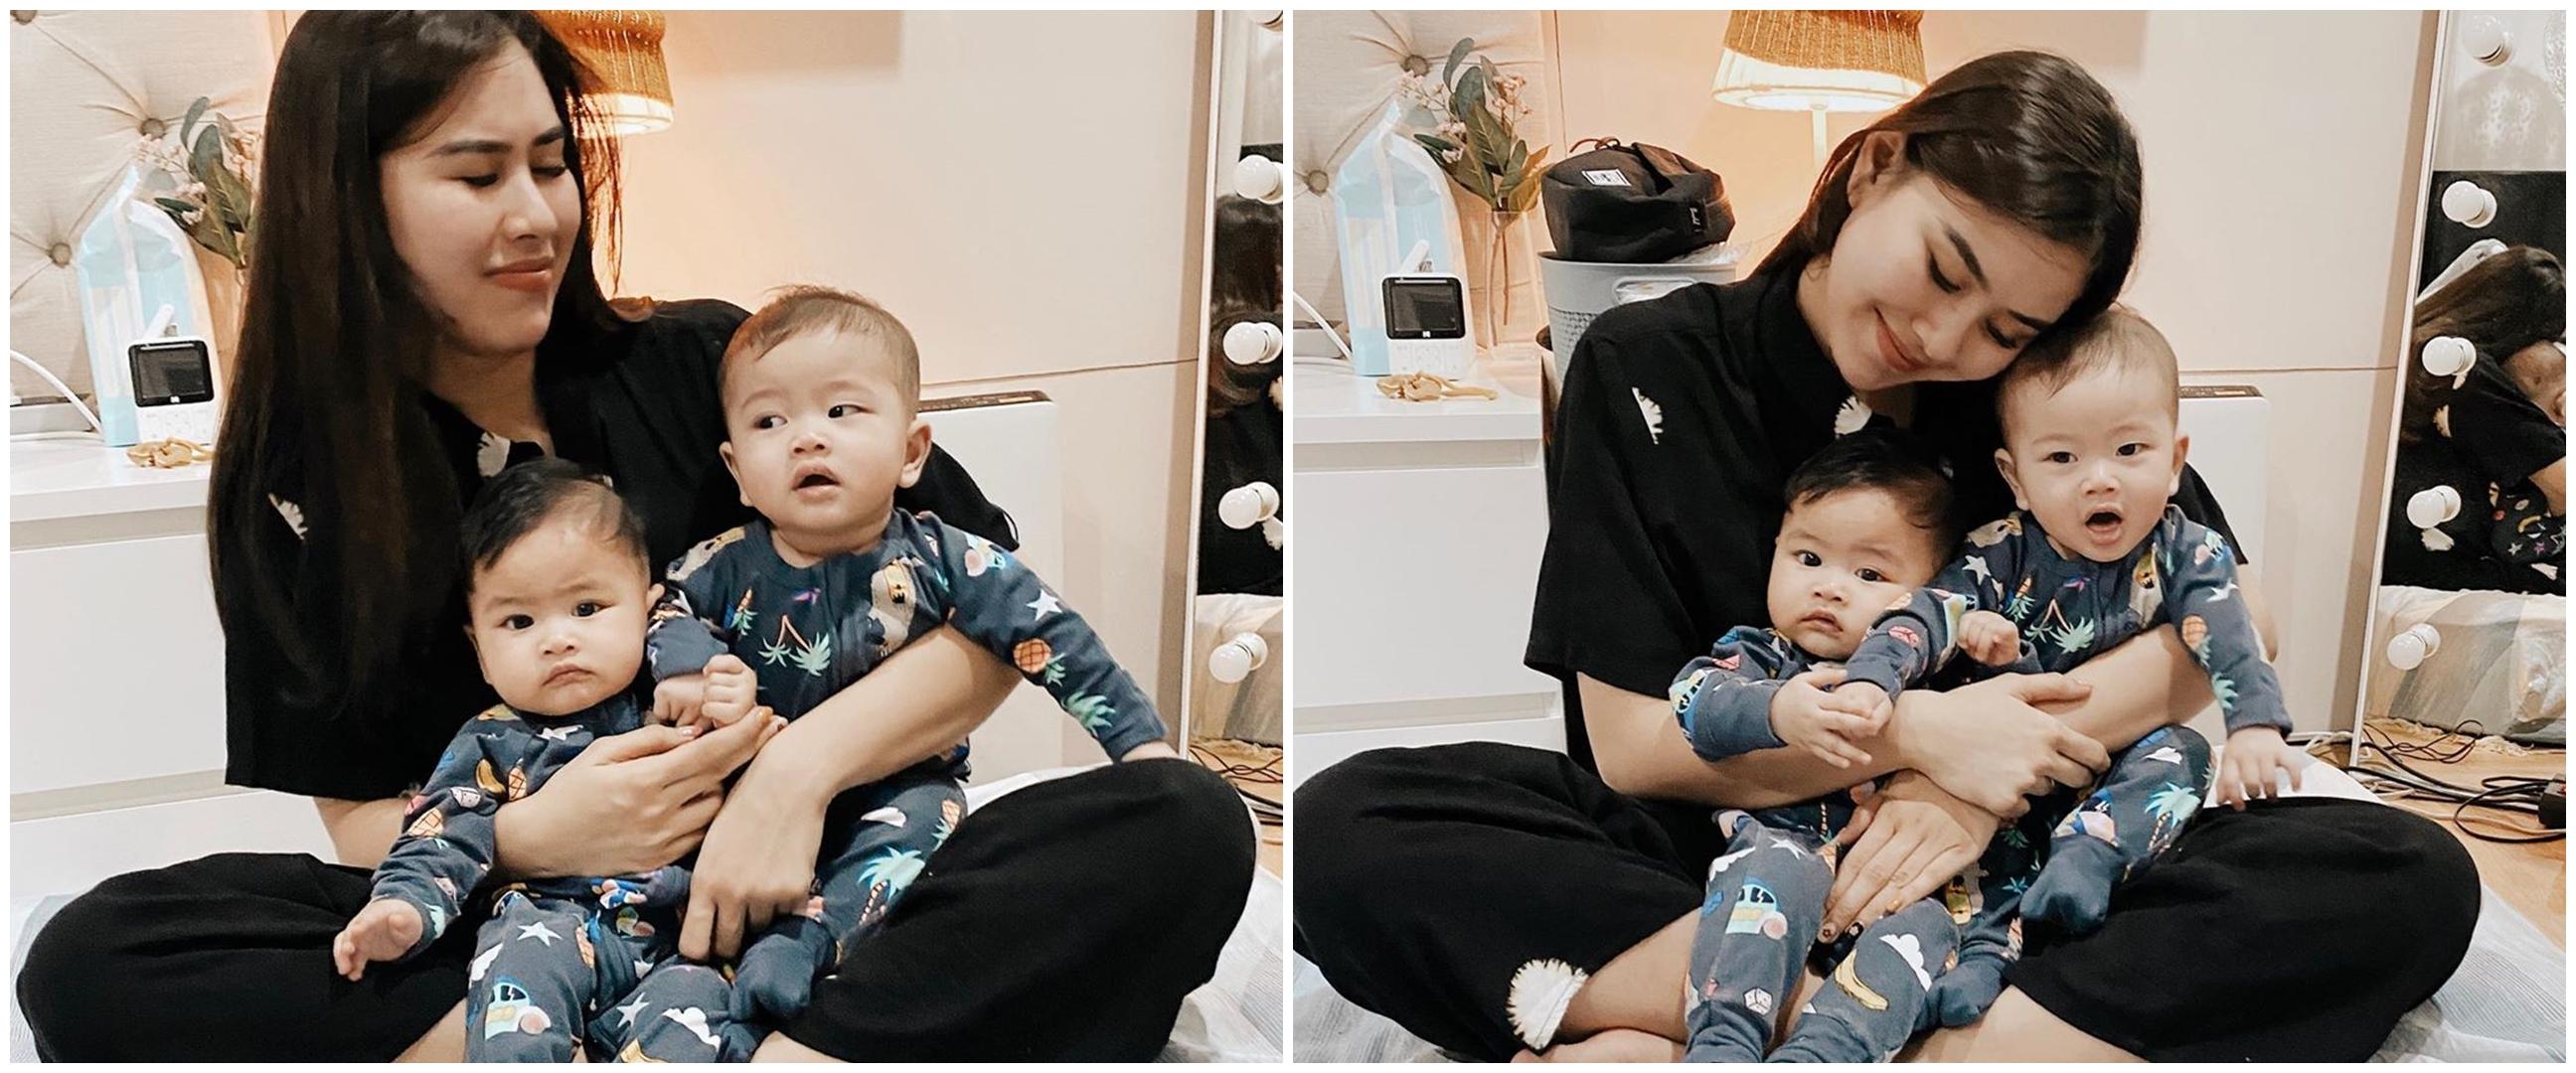 11 Momen Syahnaz urus si kembar tanpa babysitter, sempat panik